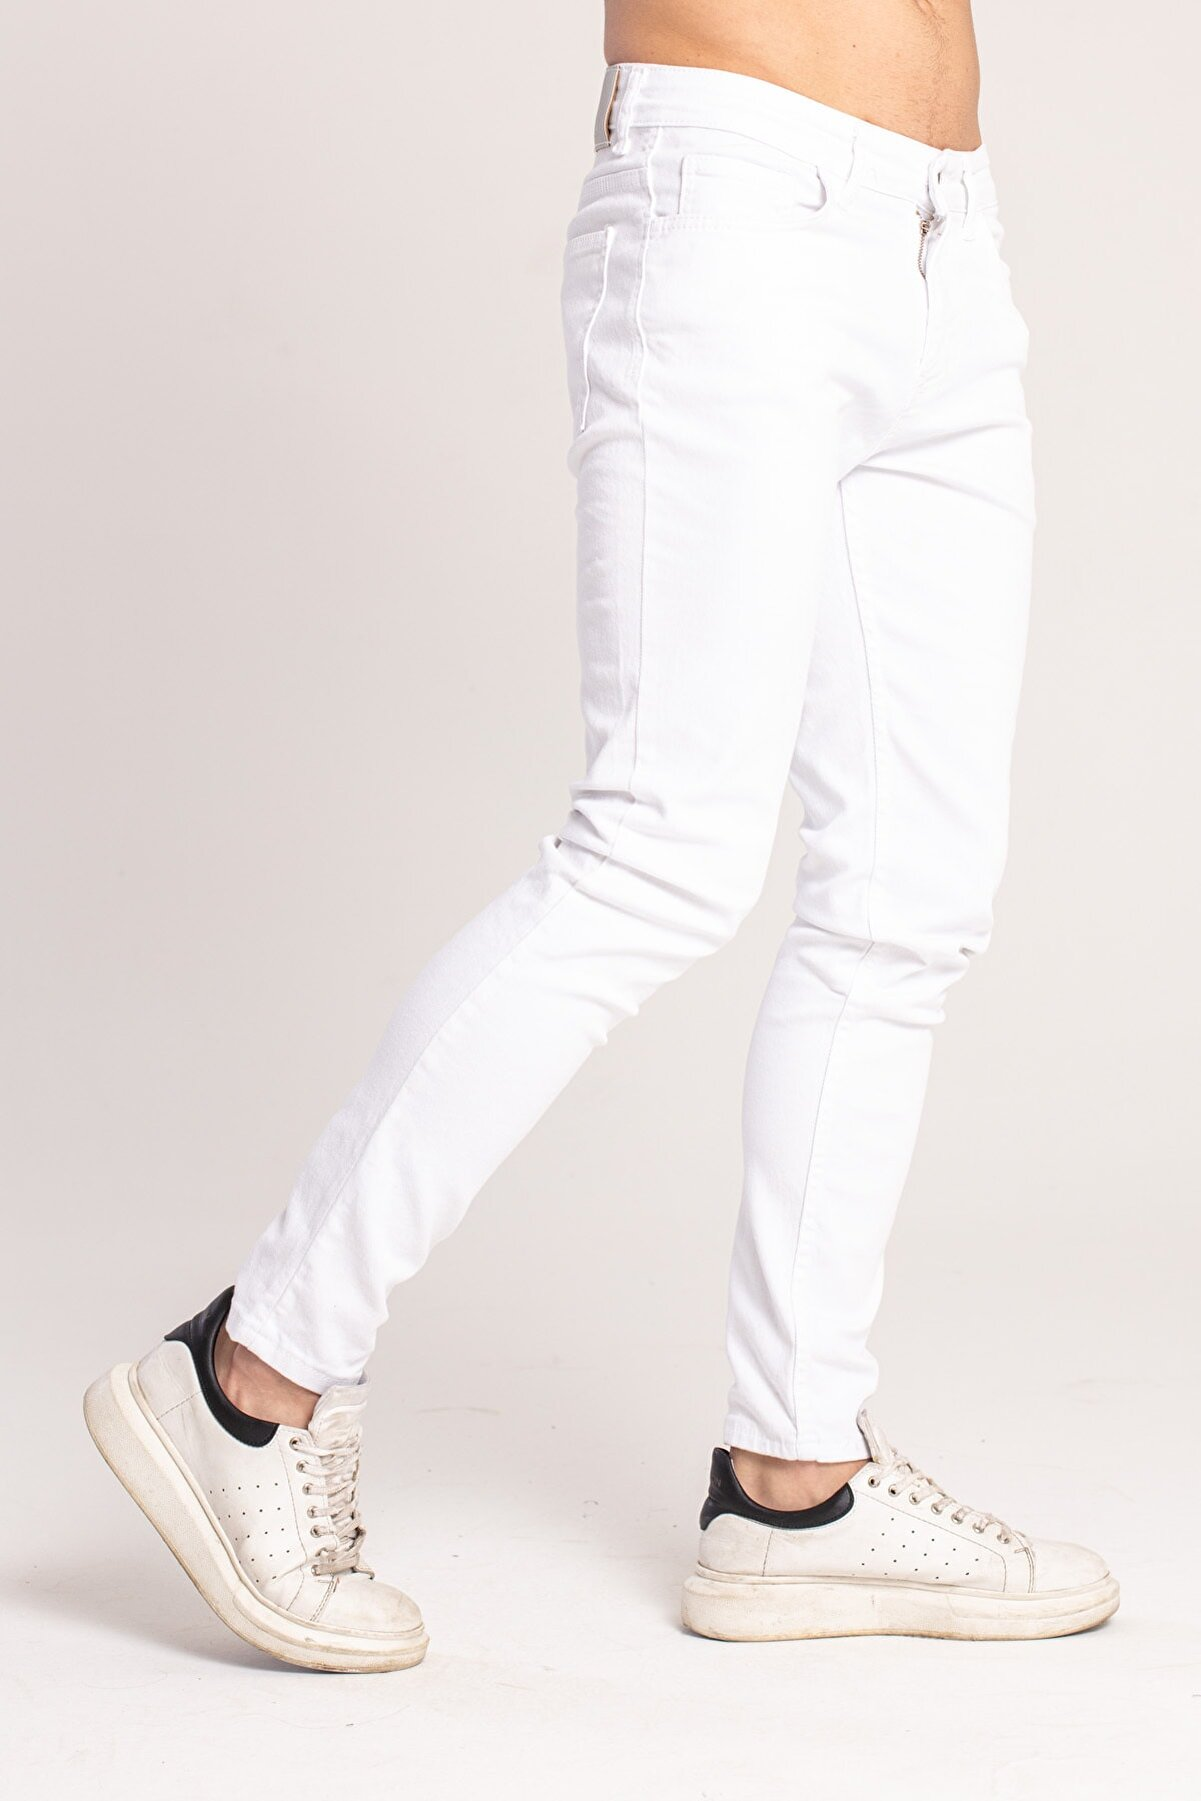 Catch Erkek Dar Kalıp Beyaz Jeans3996-r